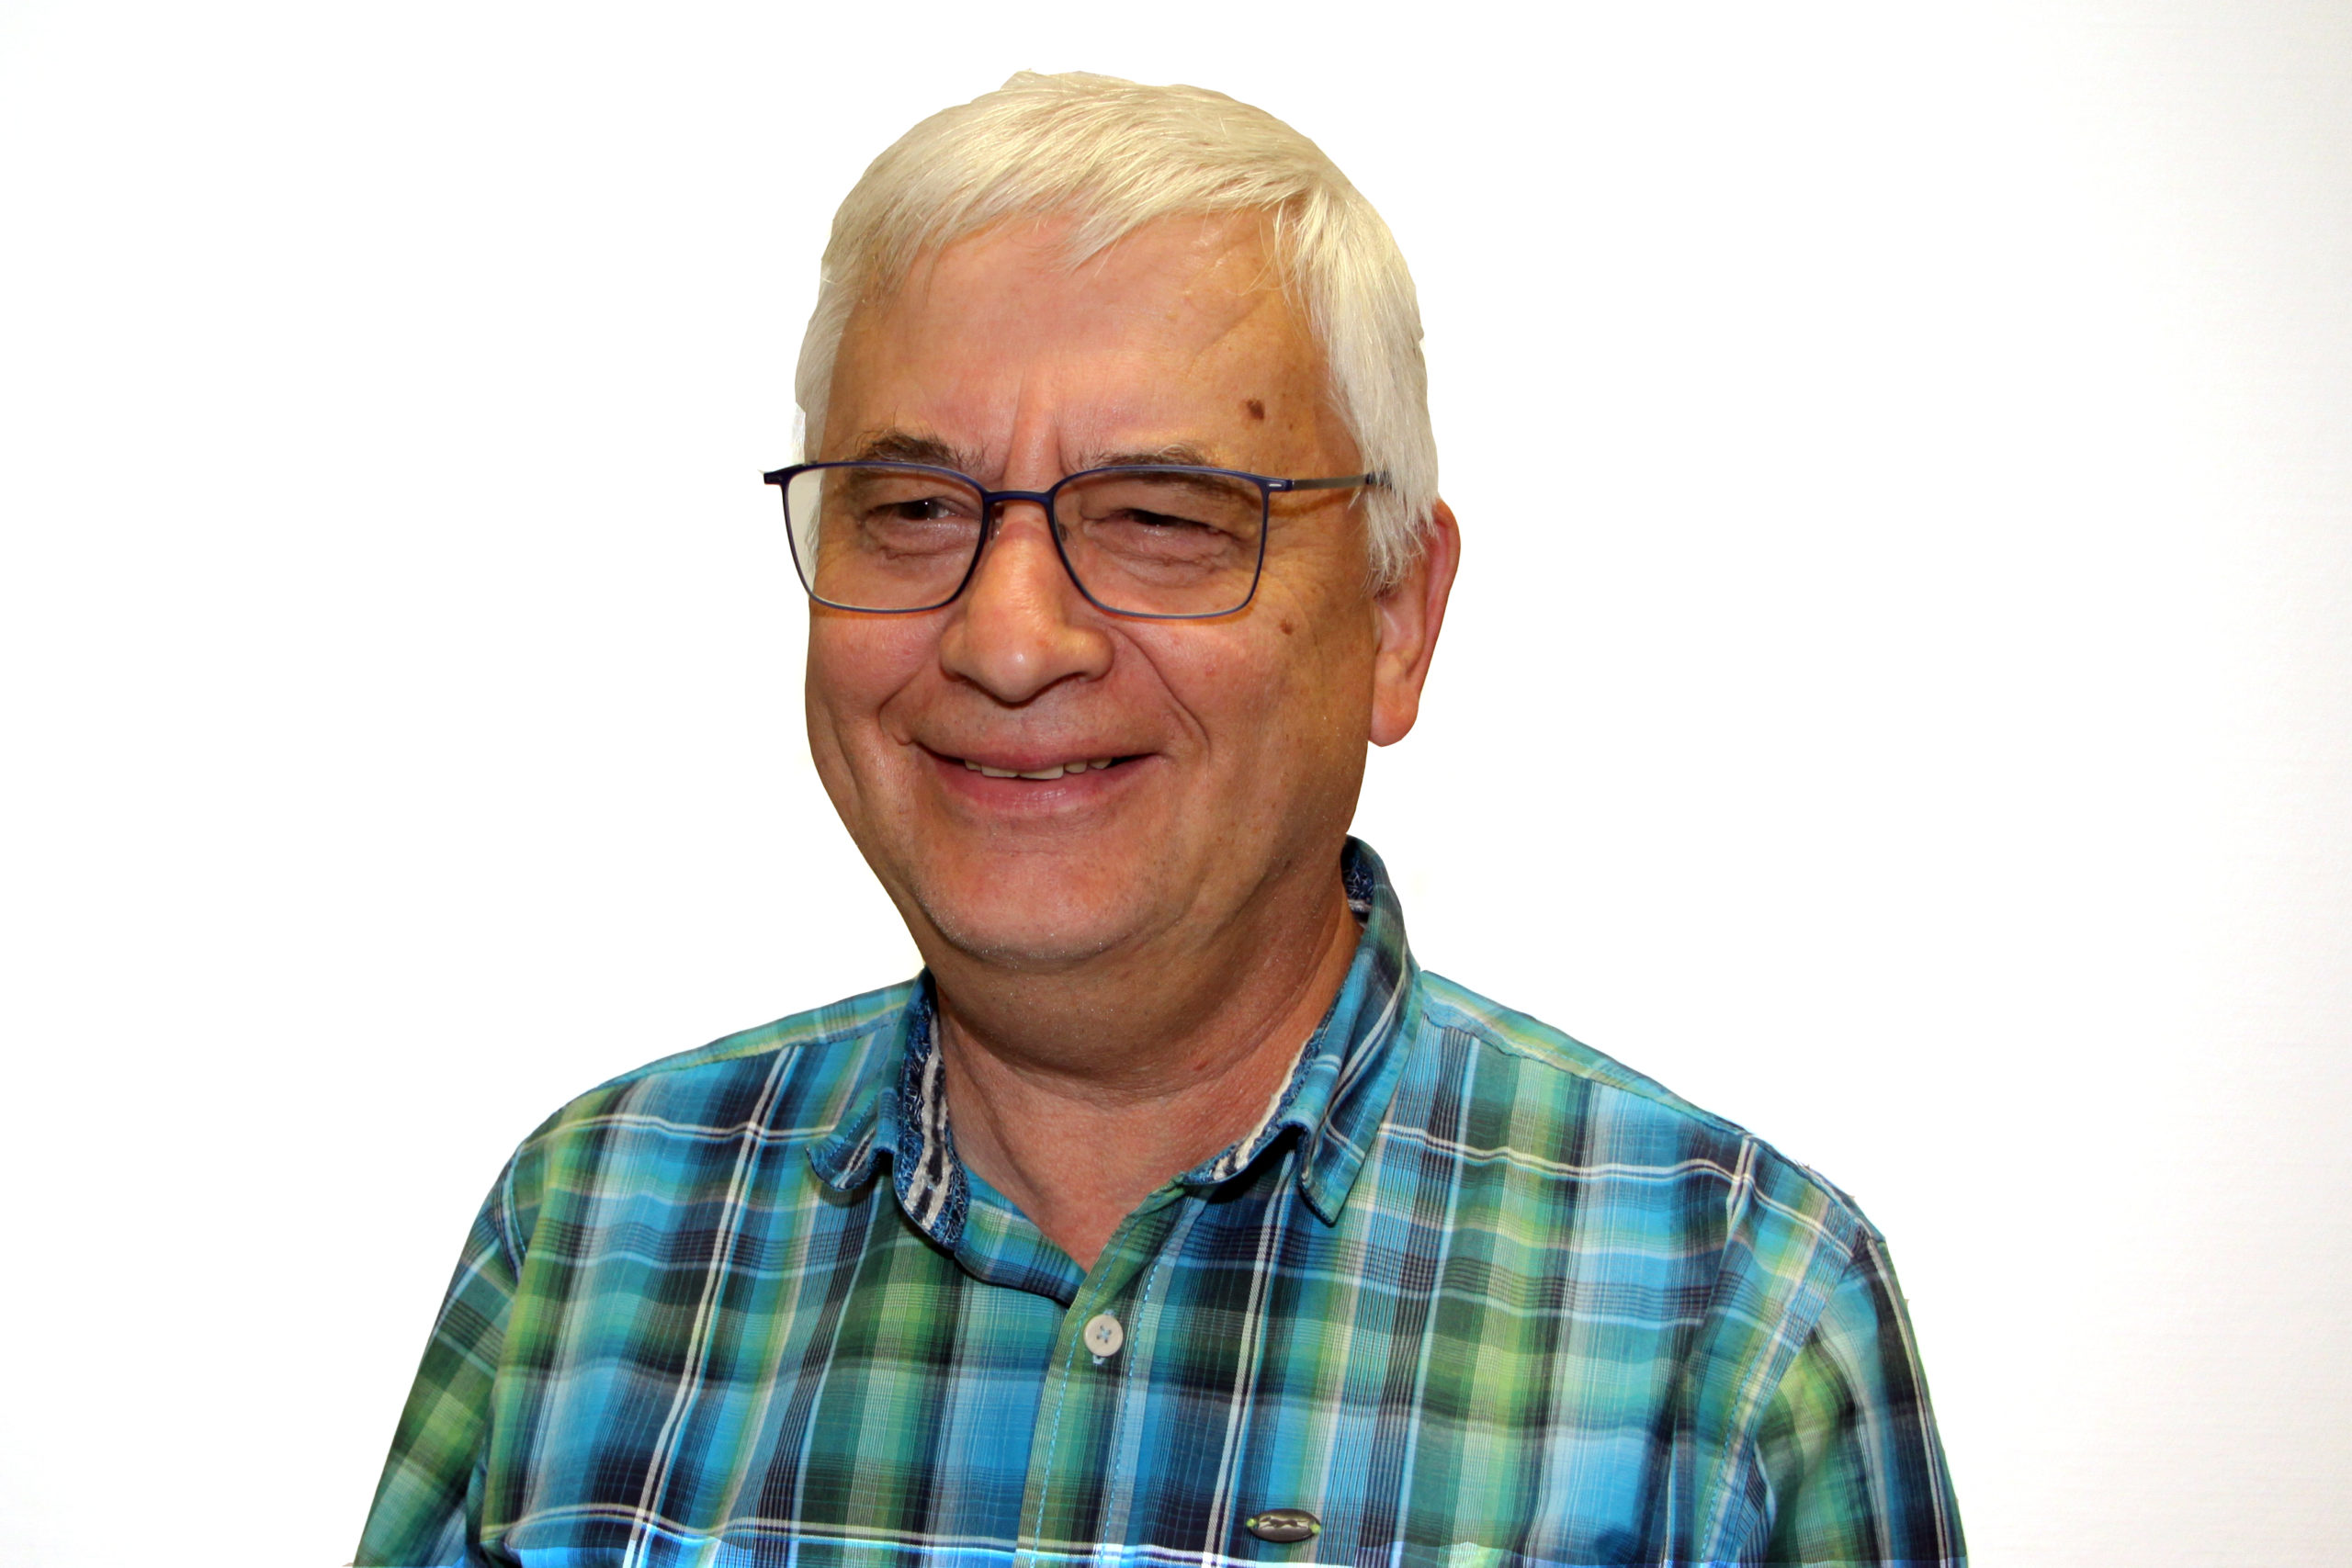 Apothekenbote Jürgen Bindzcek